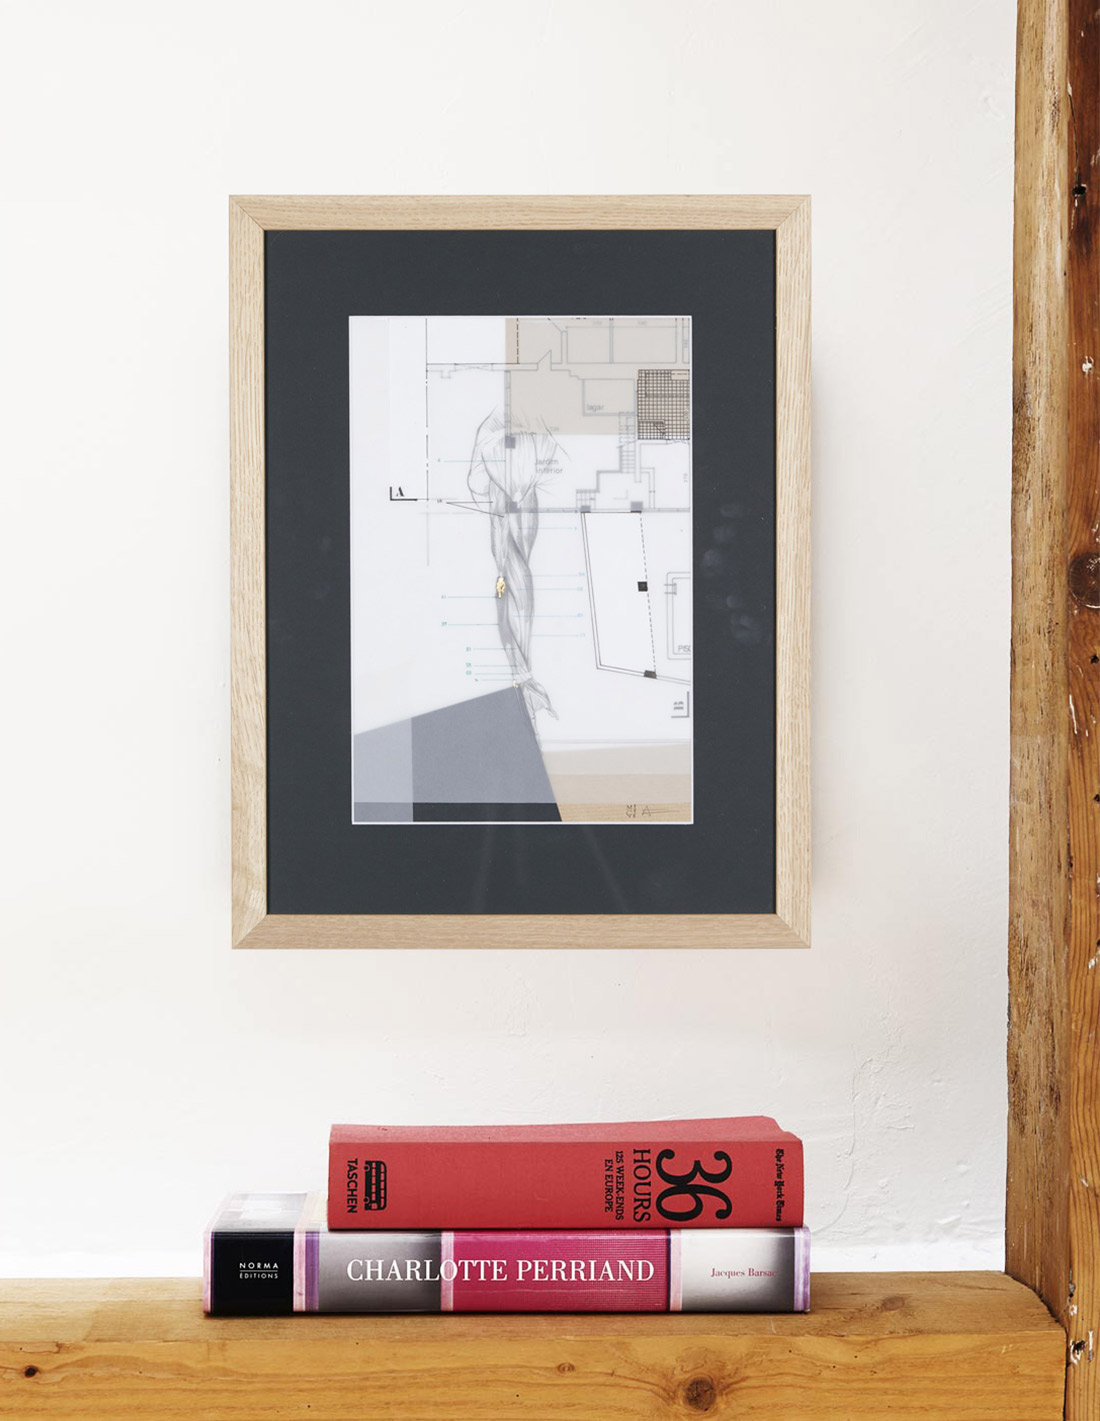 Milena Cavalan - Oeuvre sur papier - Construction-anatomique-Jardim-interior1